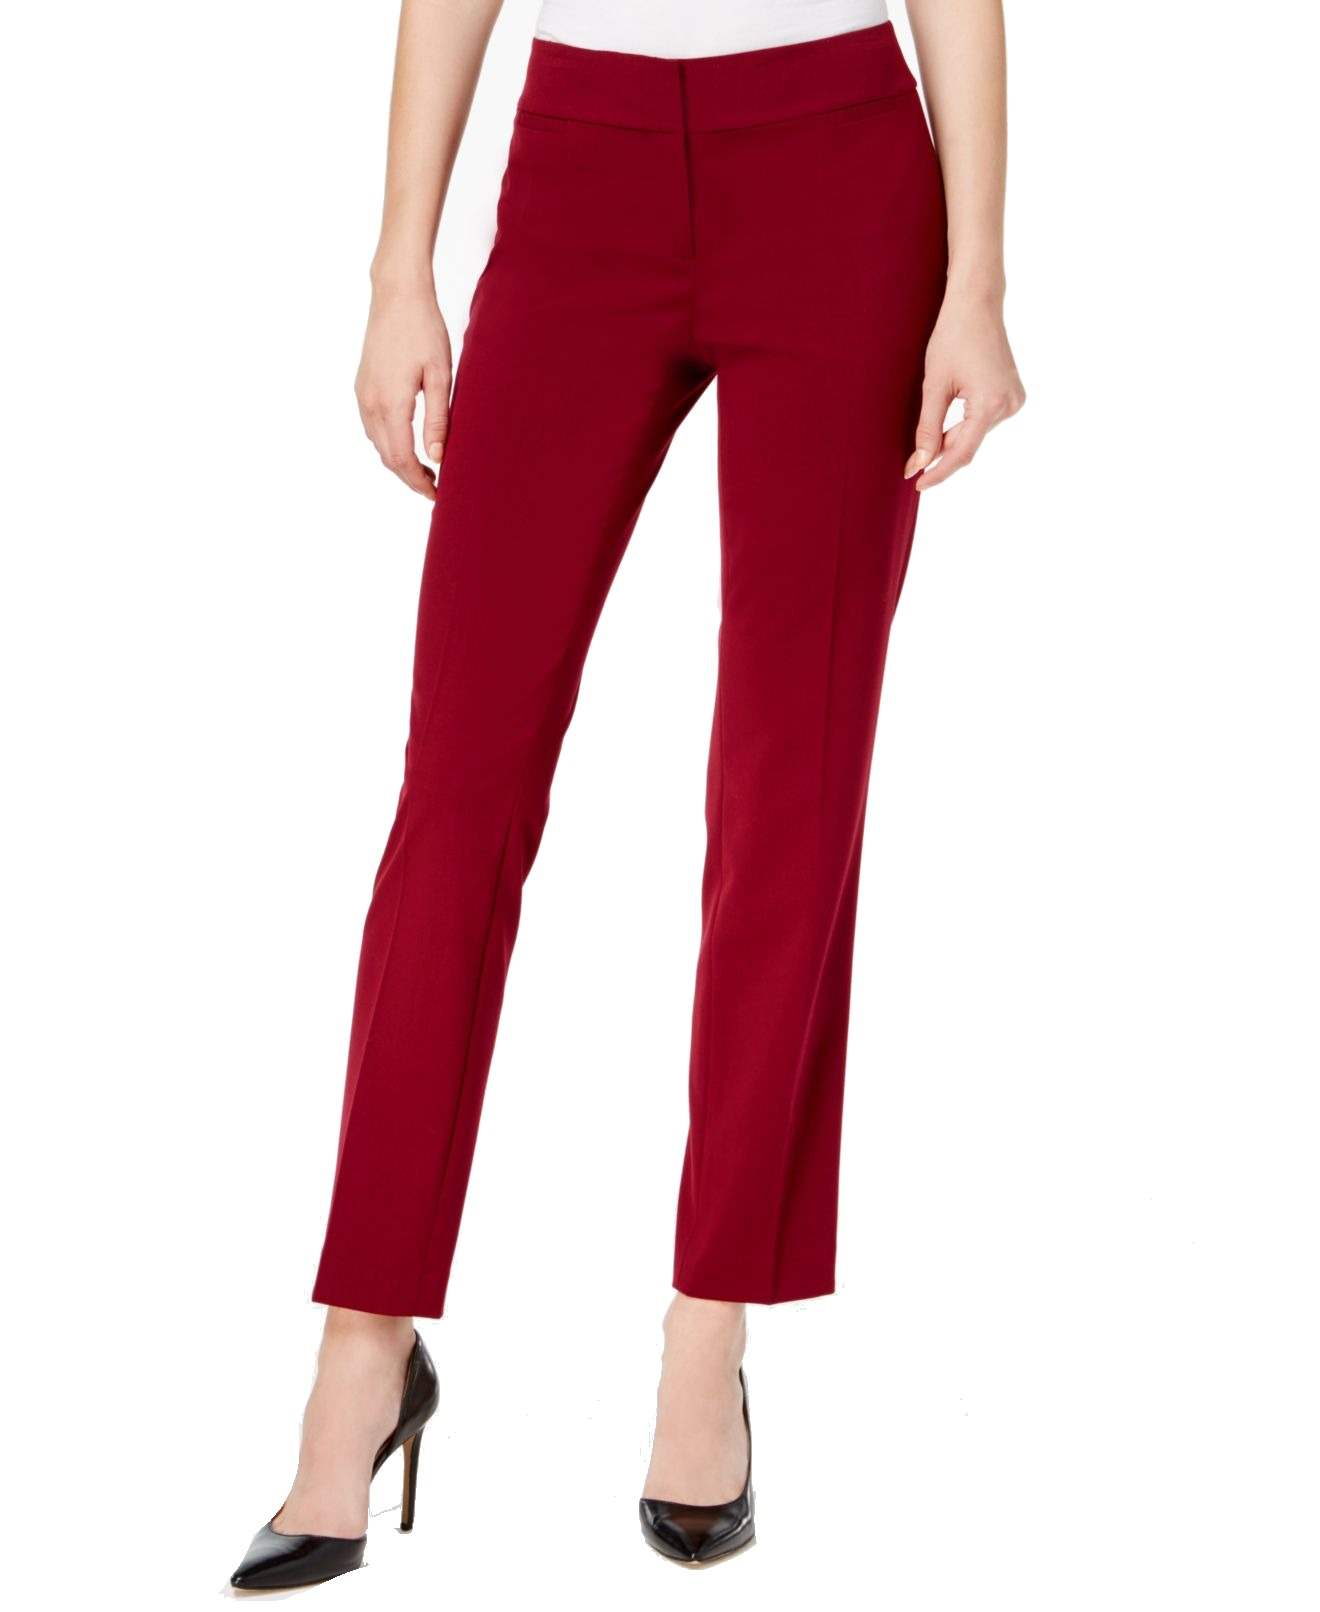 Nine West Women's Straight Leg Trouser Dress Pants